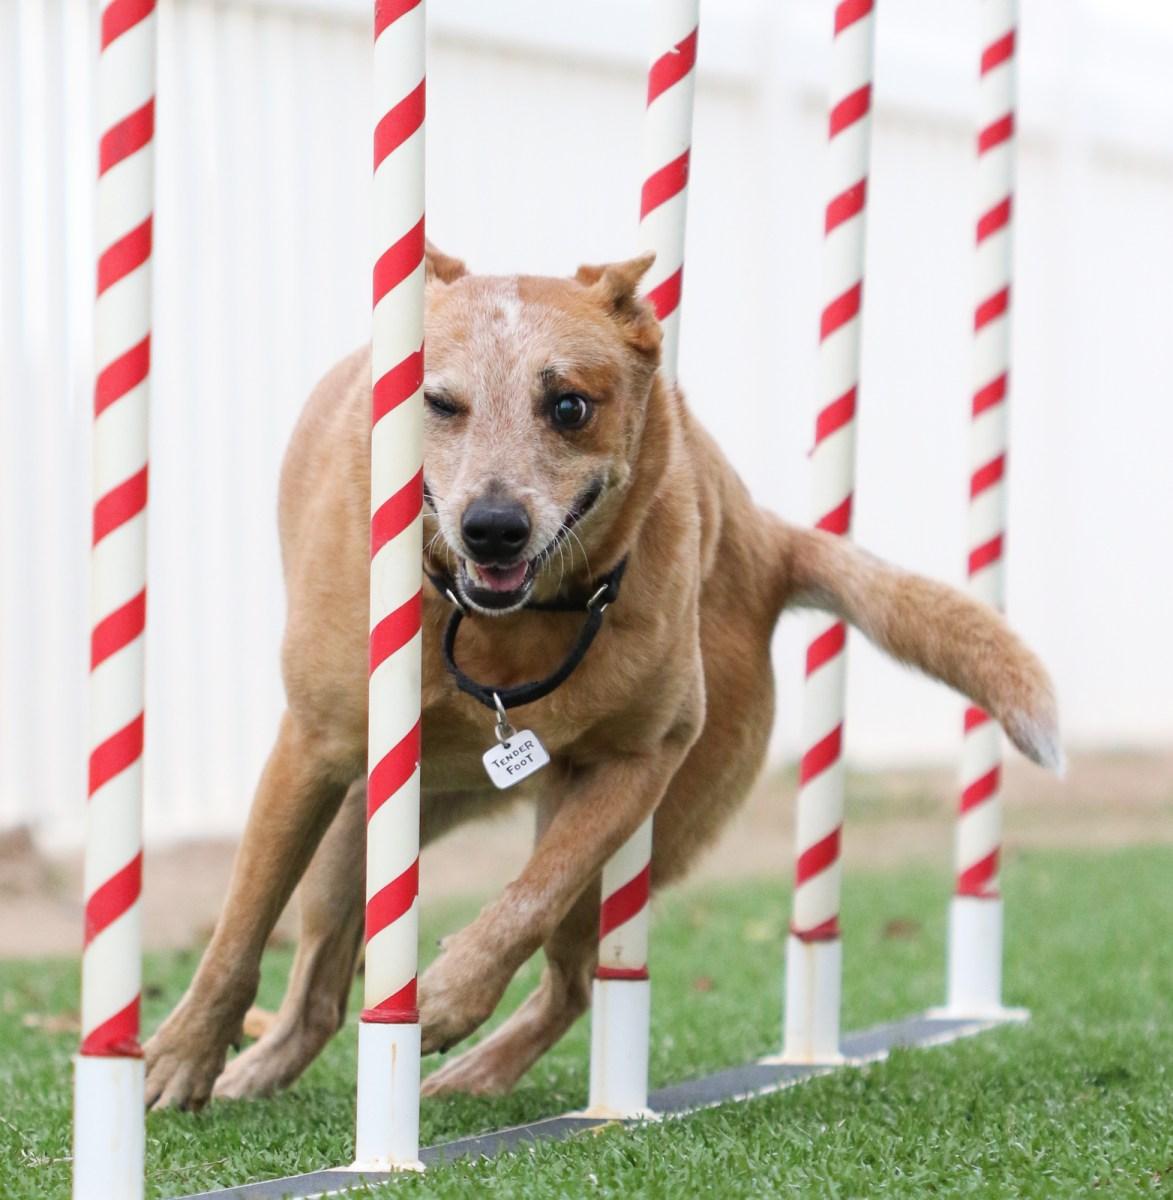 About Dog Agility Training